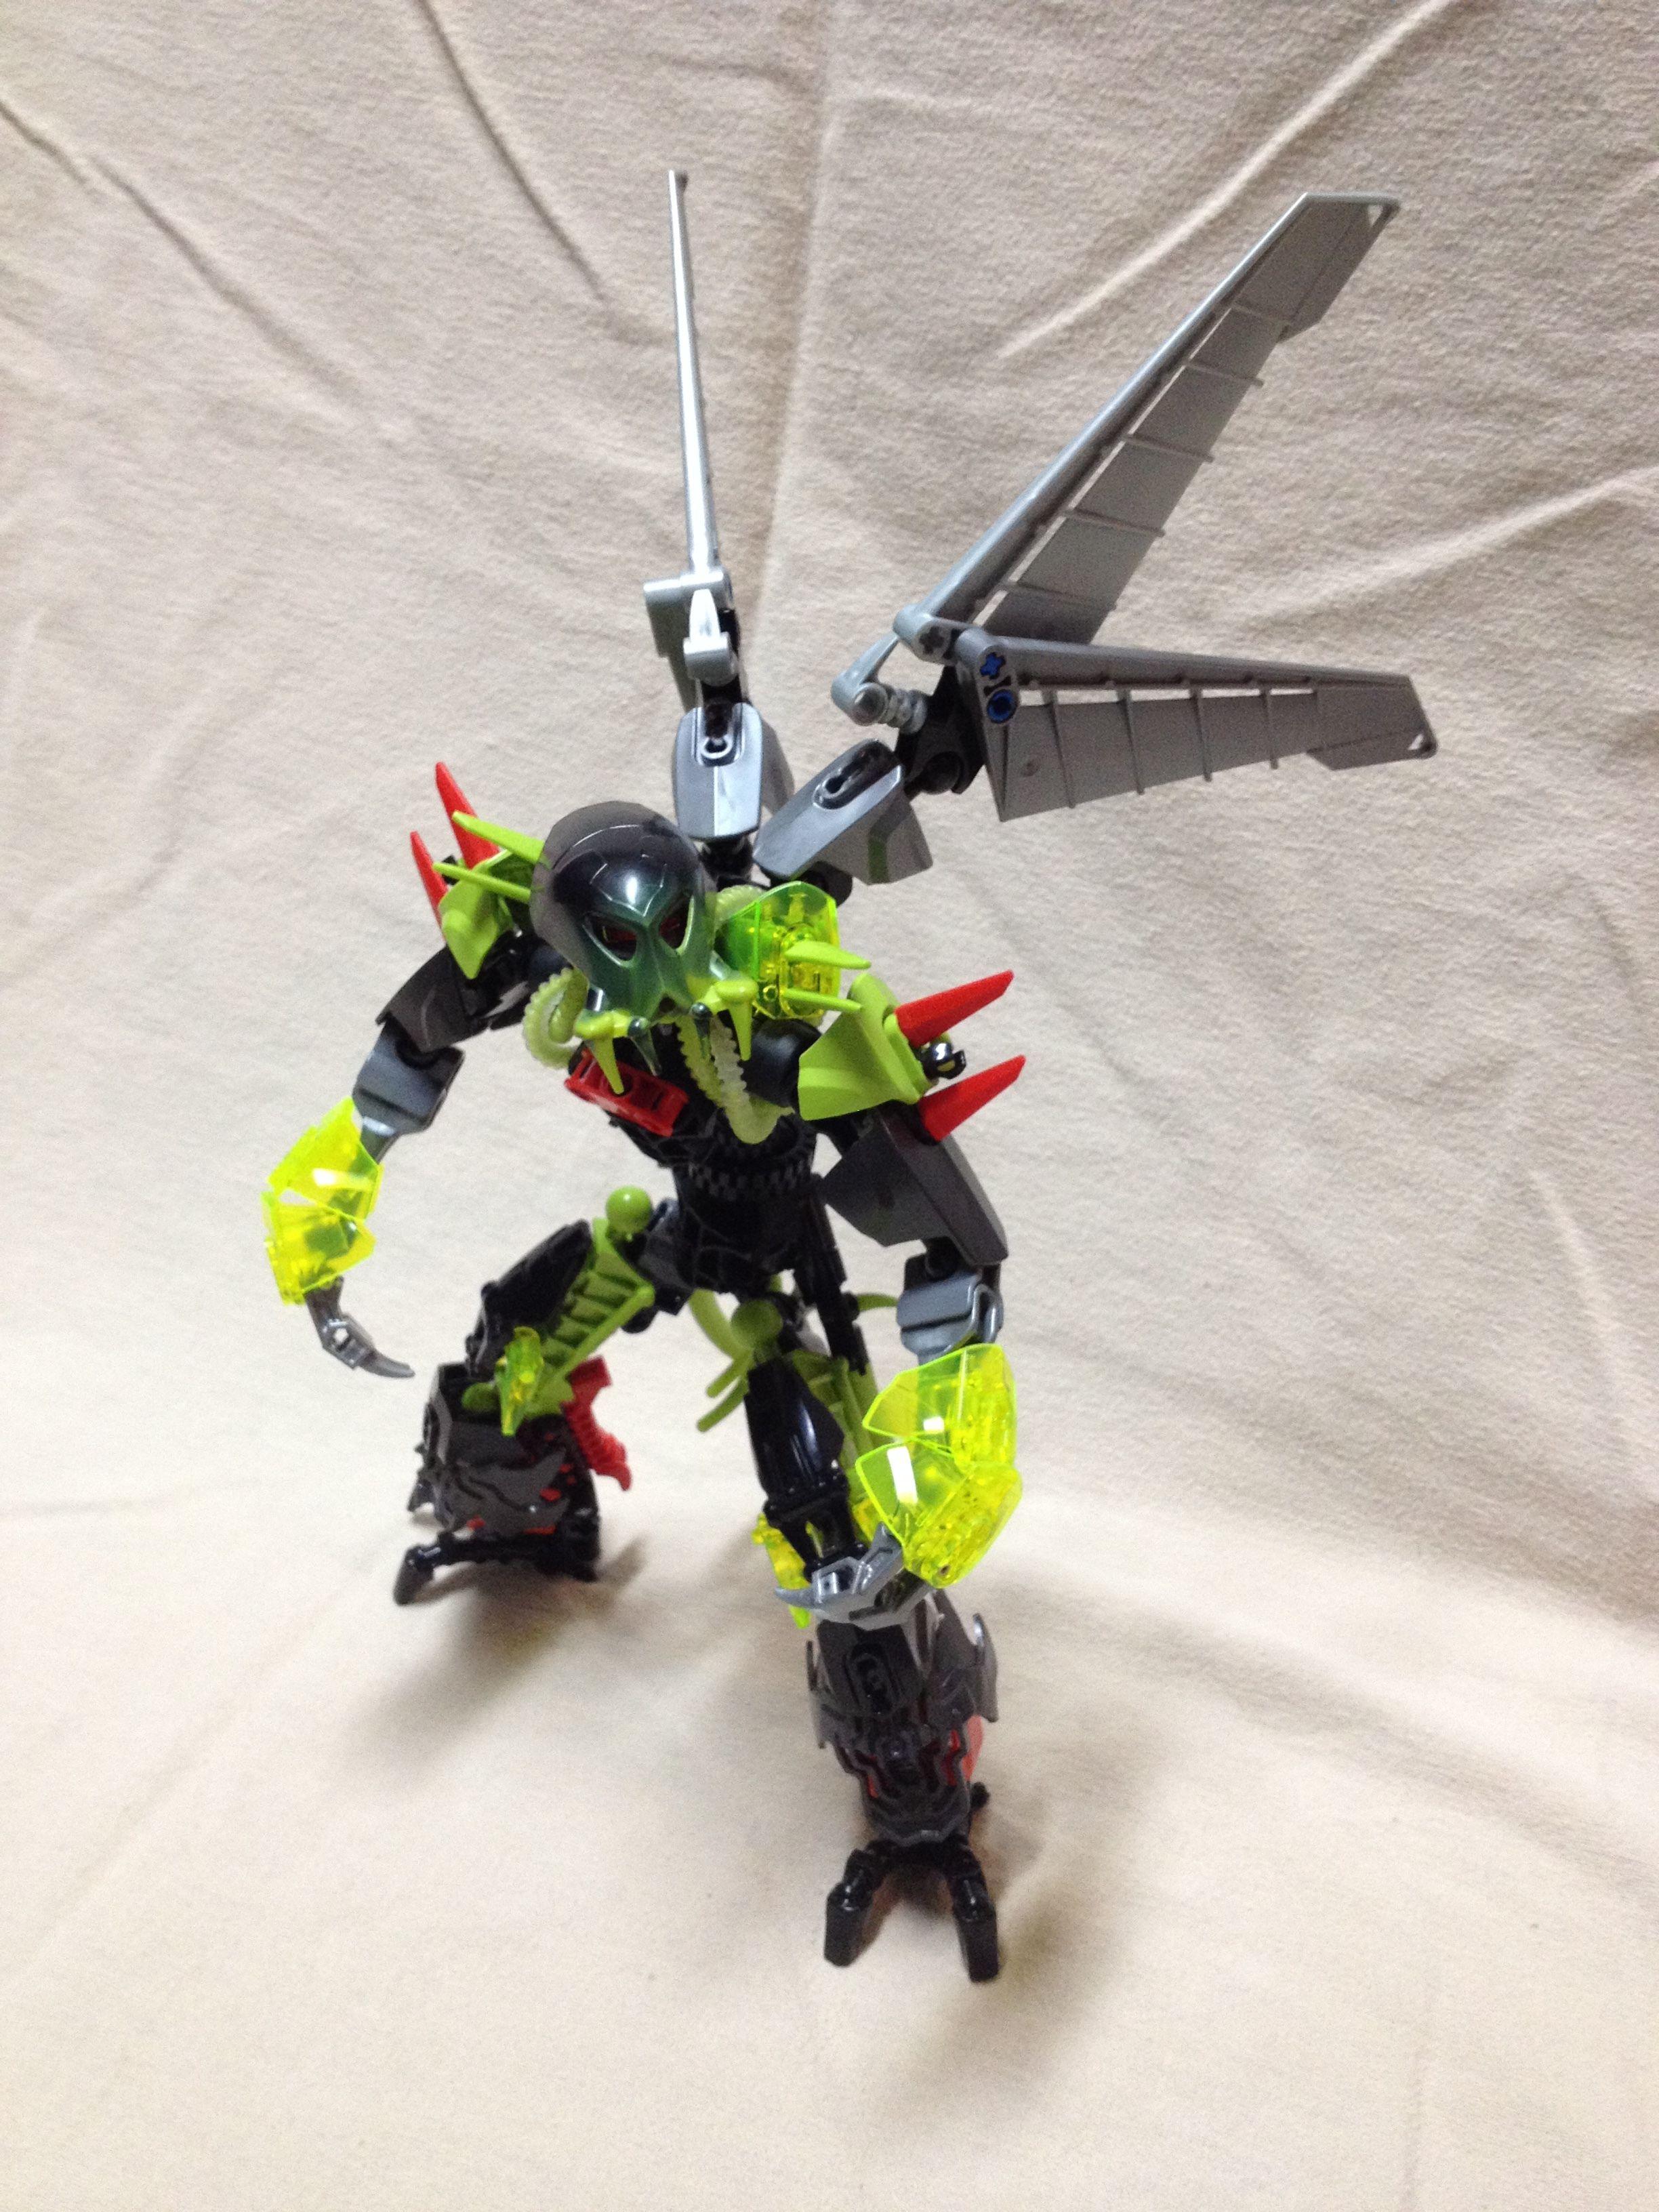 Лего Биониклы (Bionicle) - каталог наборов с инструкциями 72